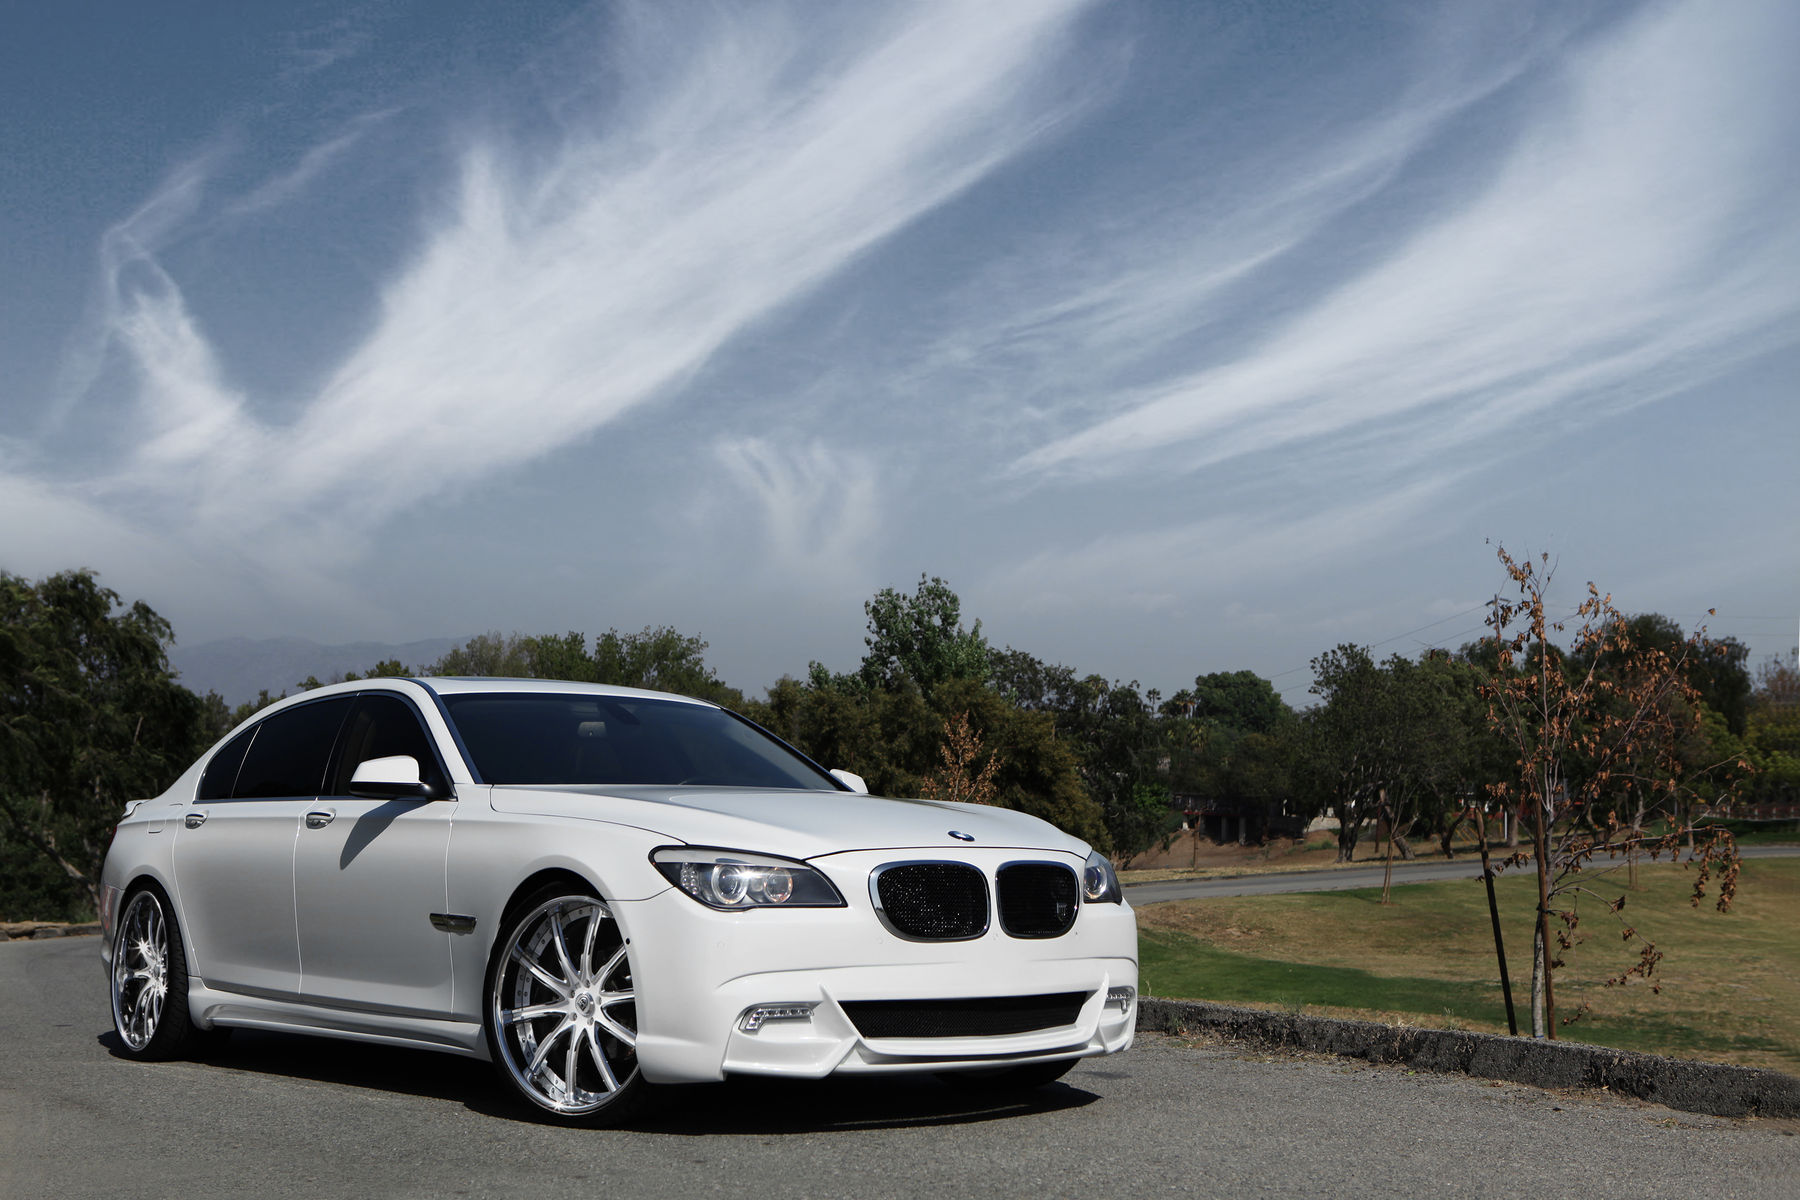 2014 BMW 7 Series | BMW 750i on Lexani LS709's